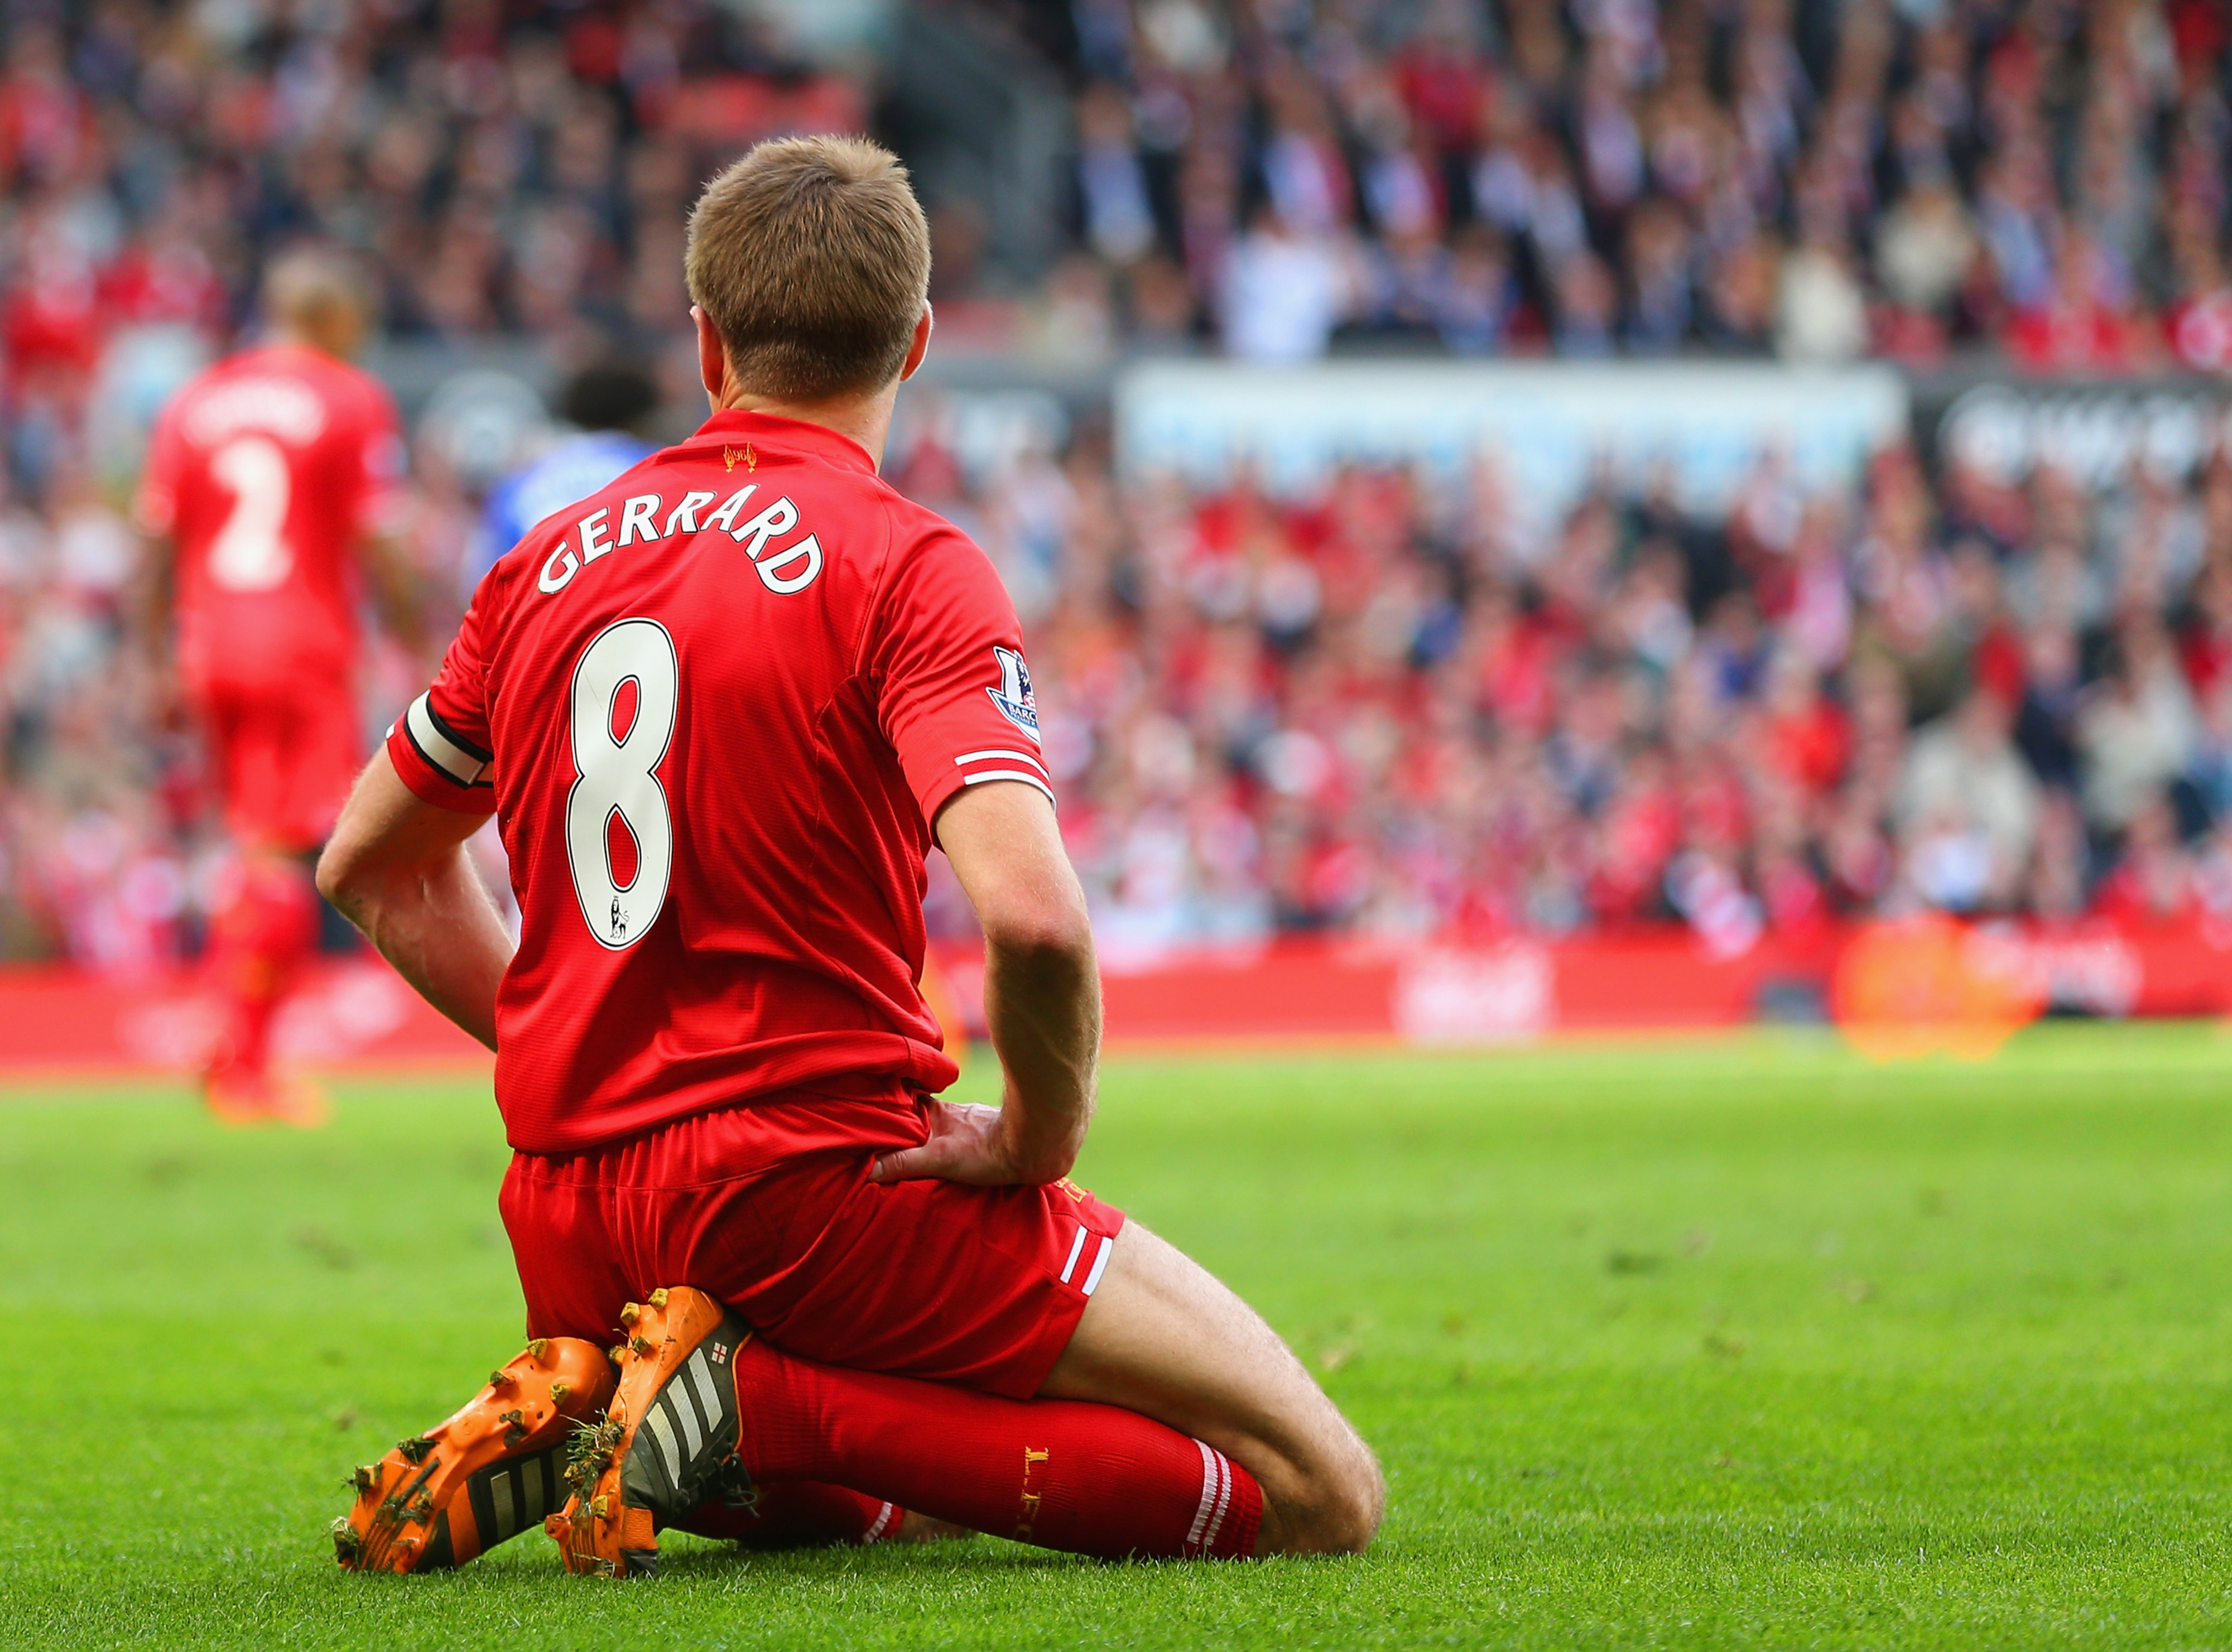 Steven Gerrard is back in Liverpool's lineup against Chelsea